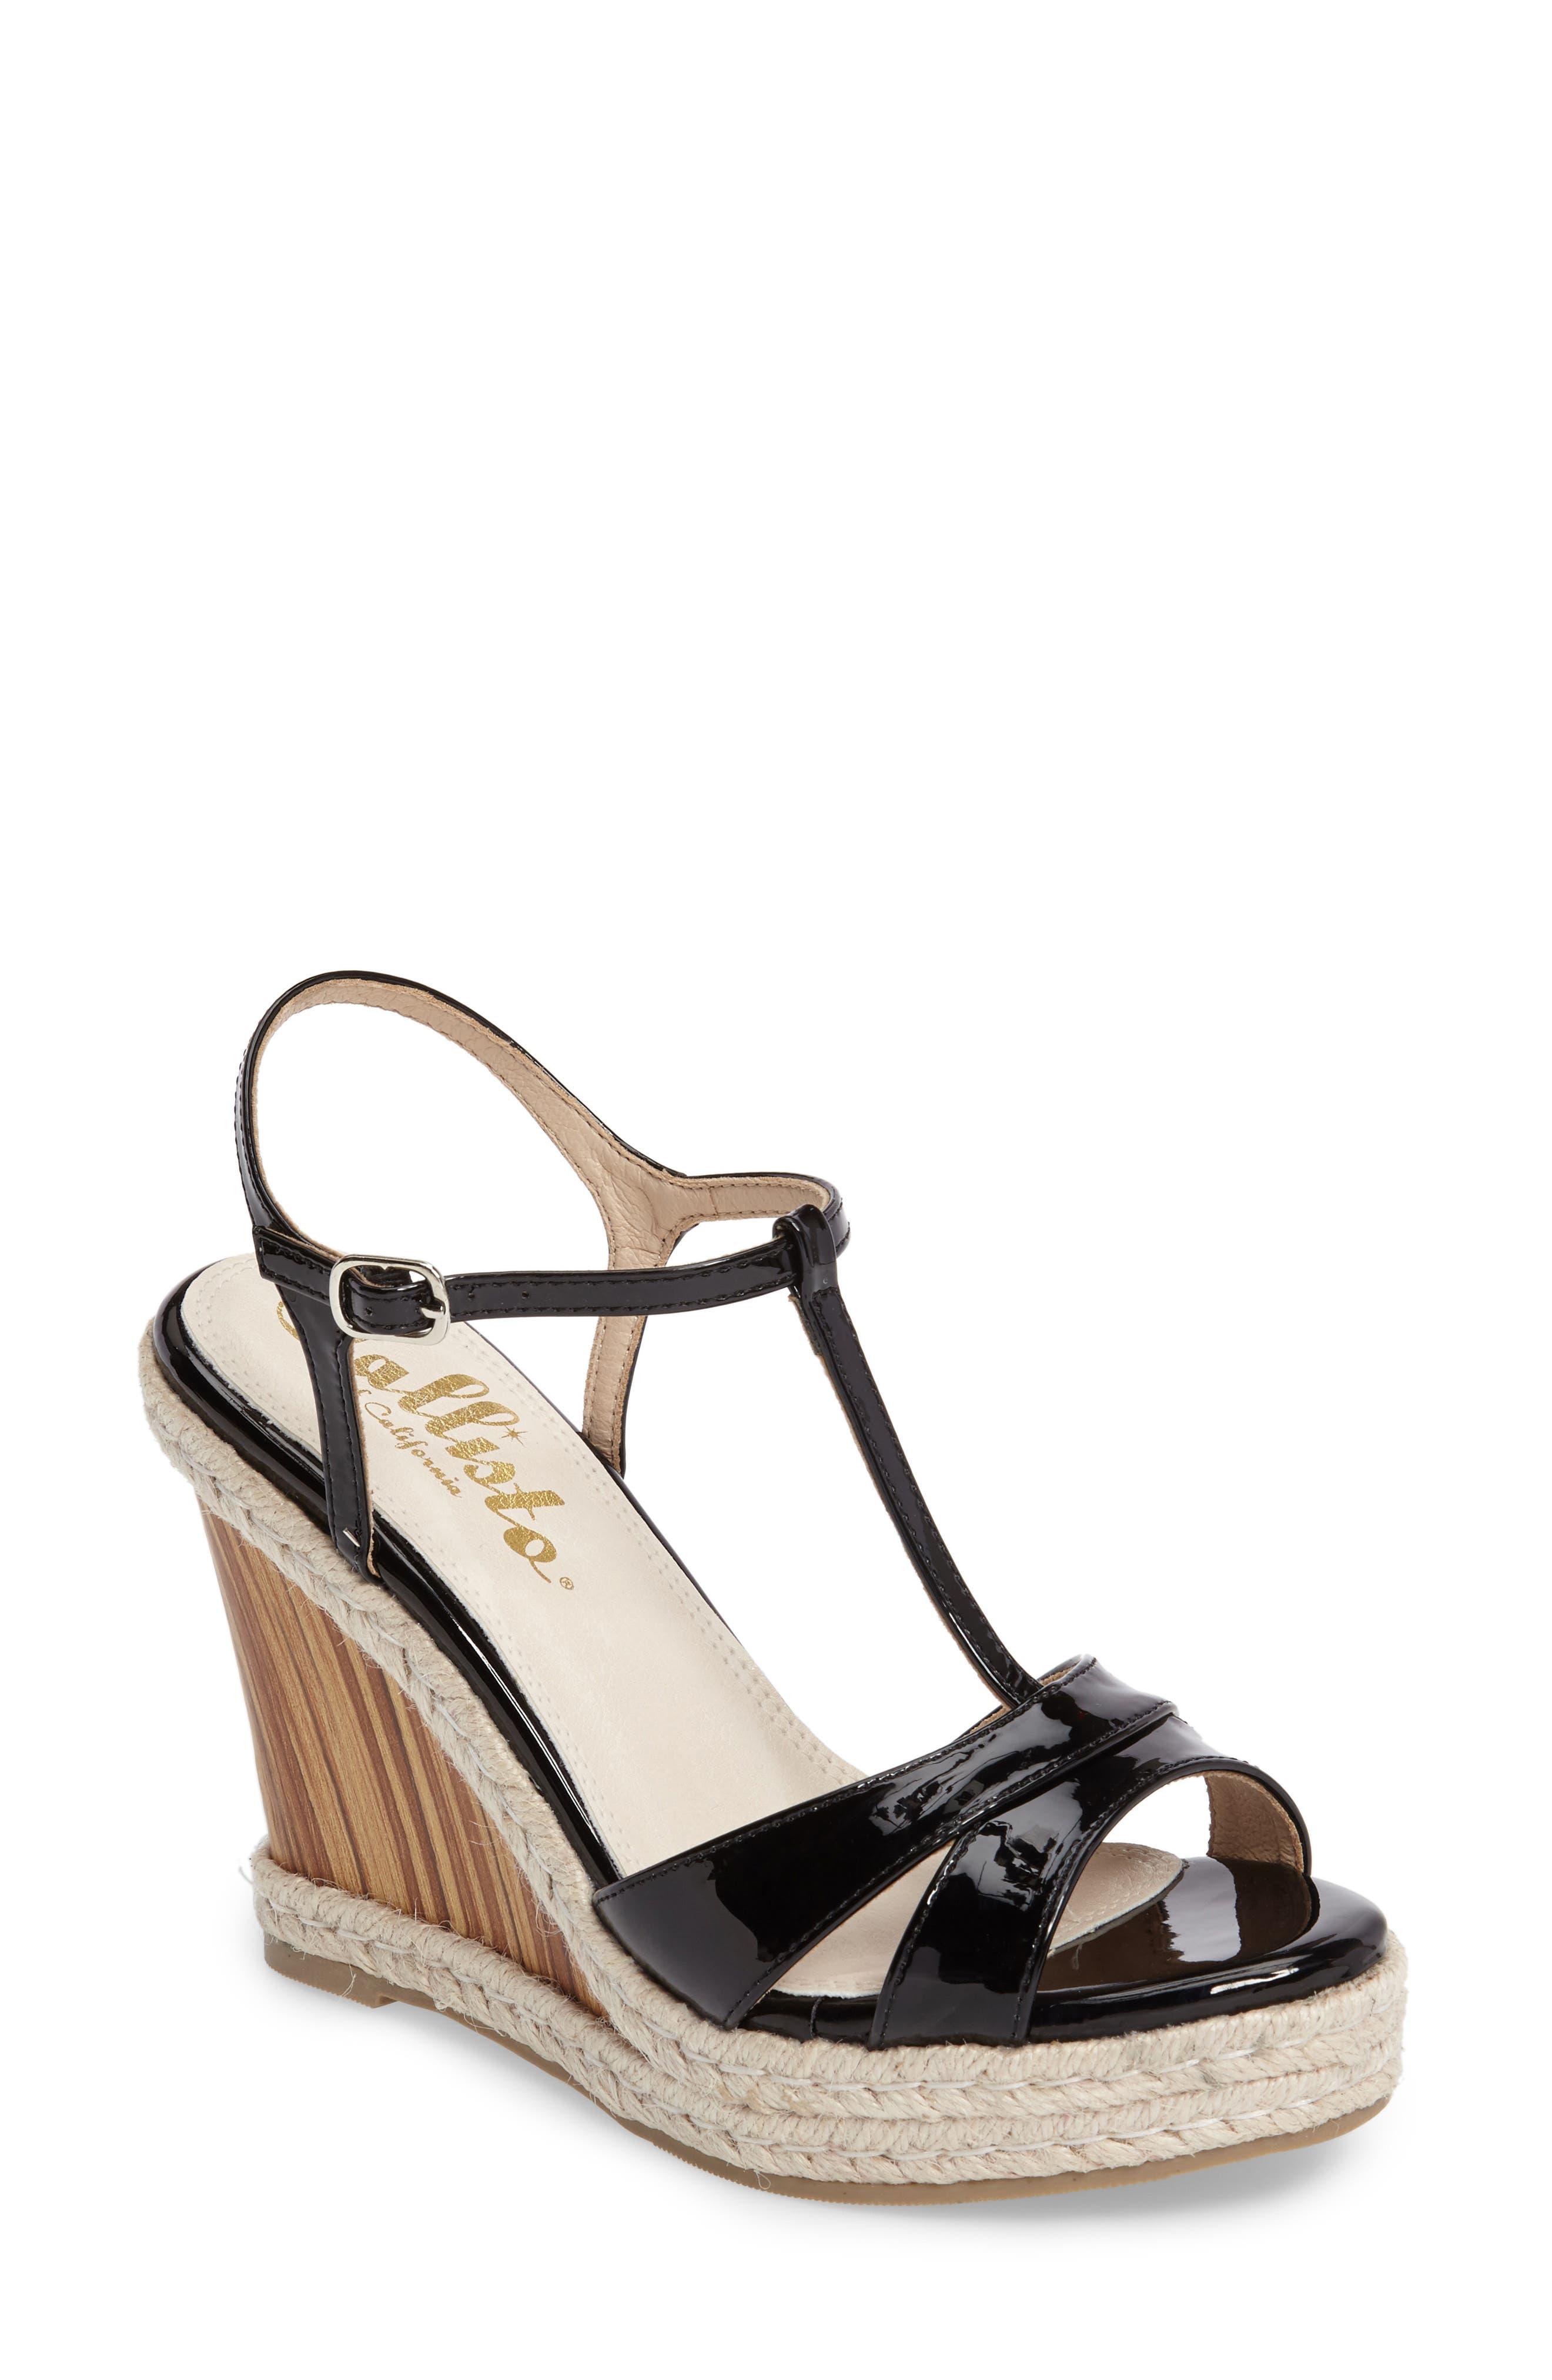 Alinna T-Strap Wedge Sandal,                         Main,                         color, 002